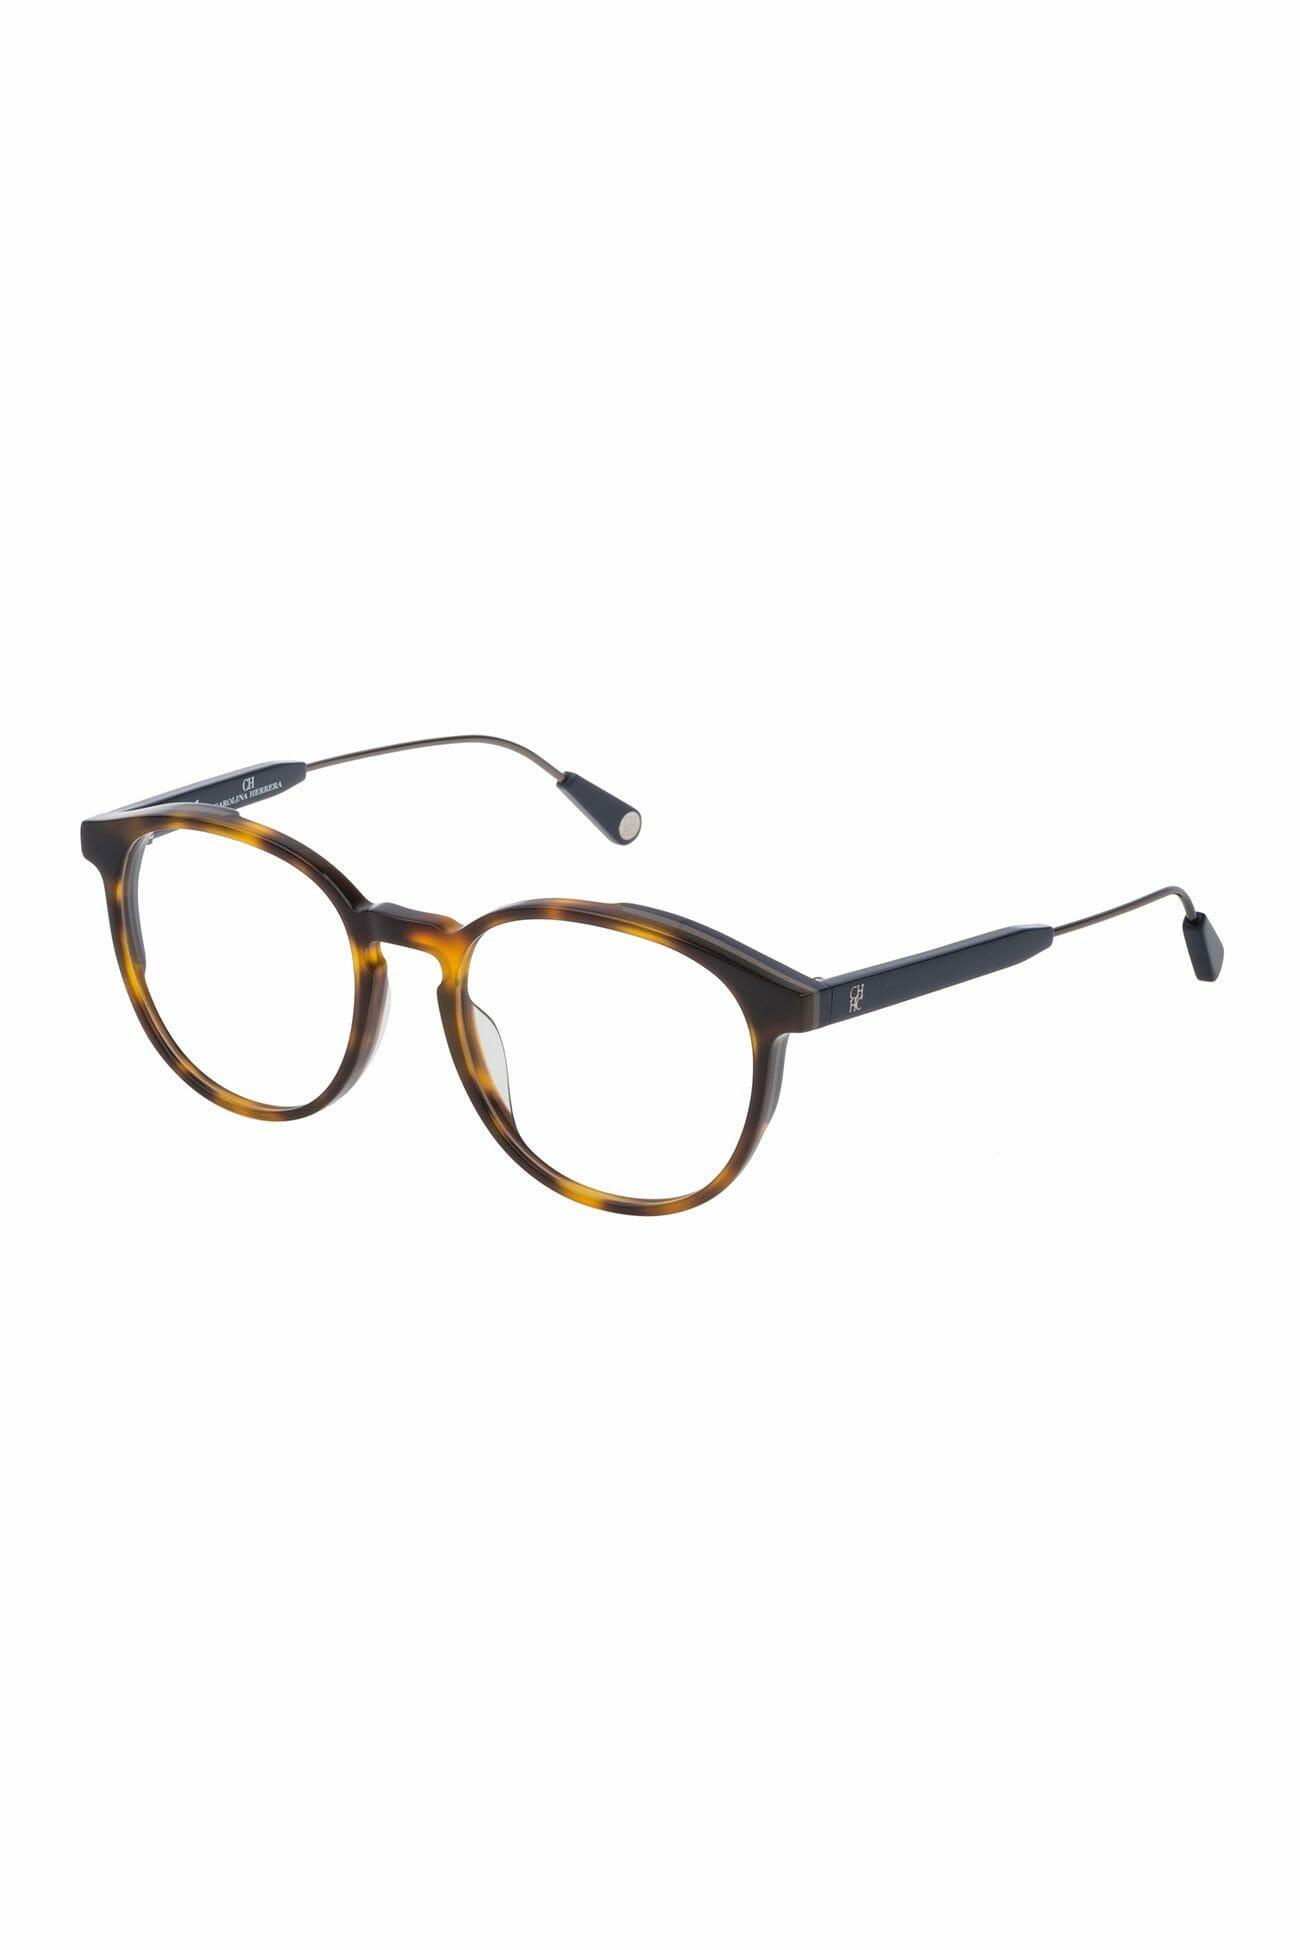 CH-Carolina-Herrera-Eyeglasses-optical-Men